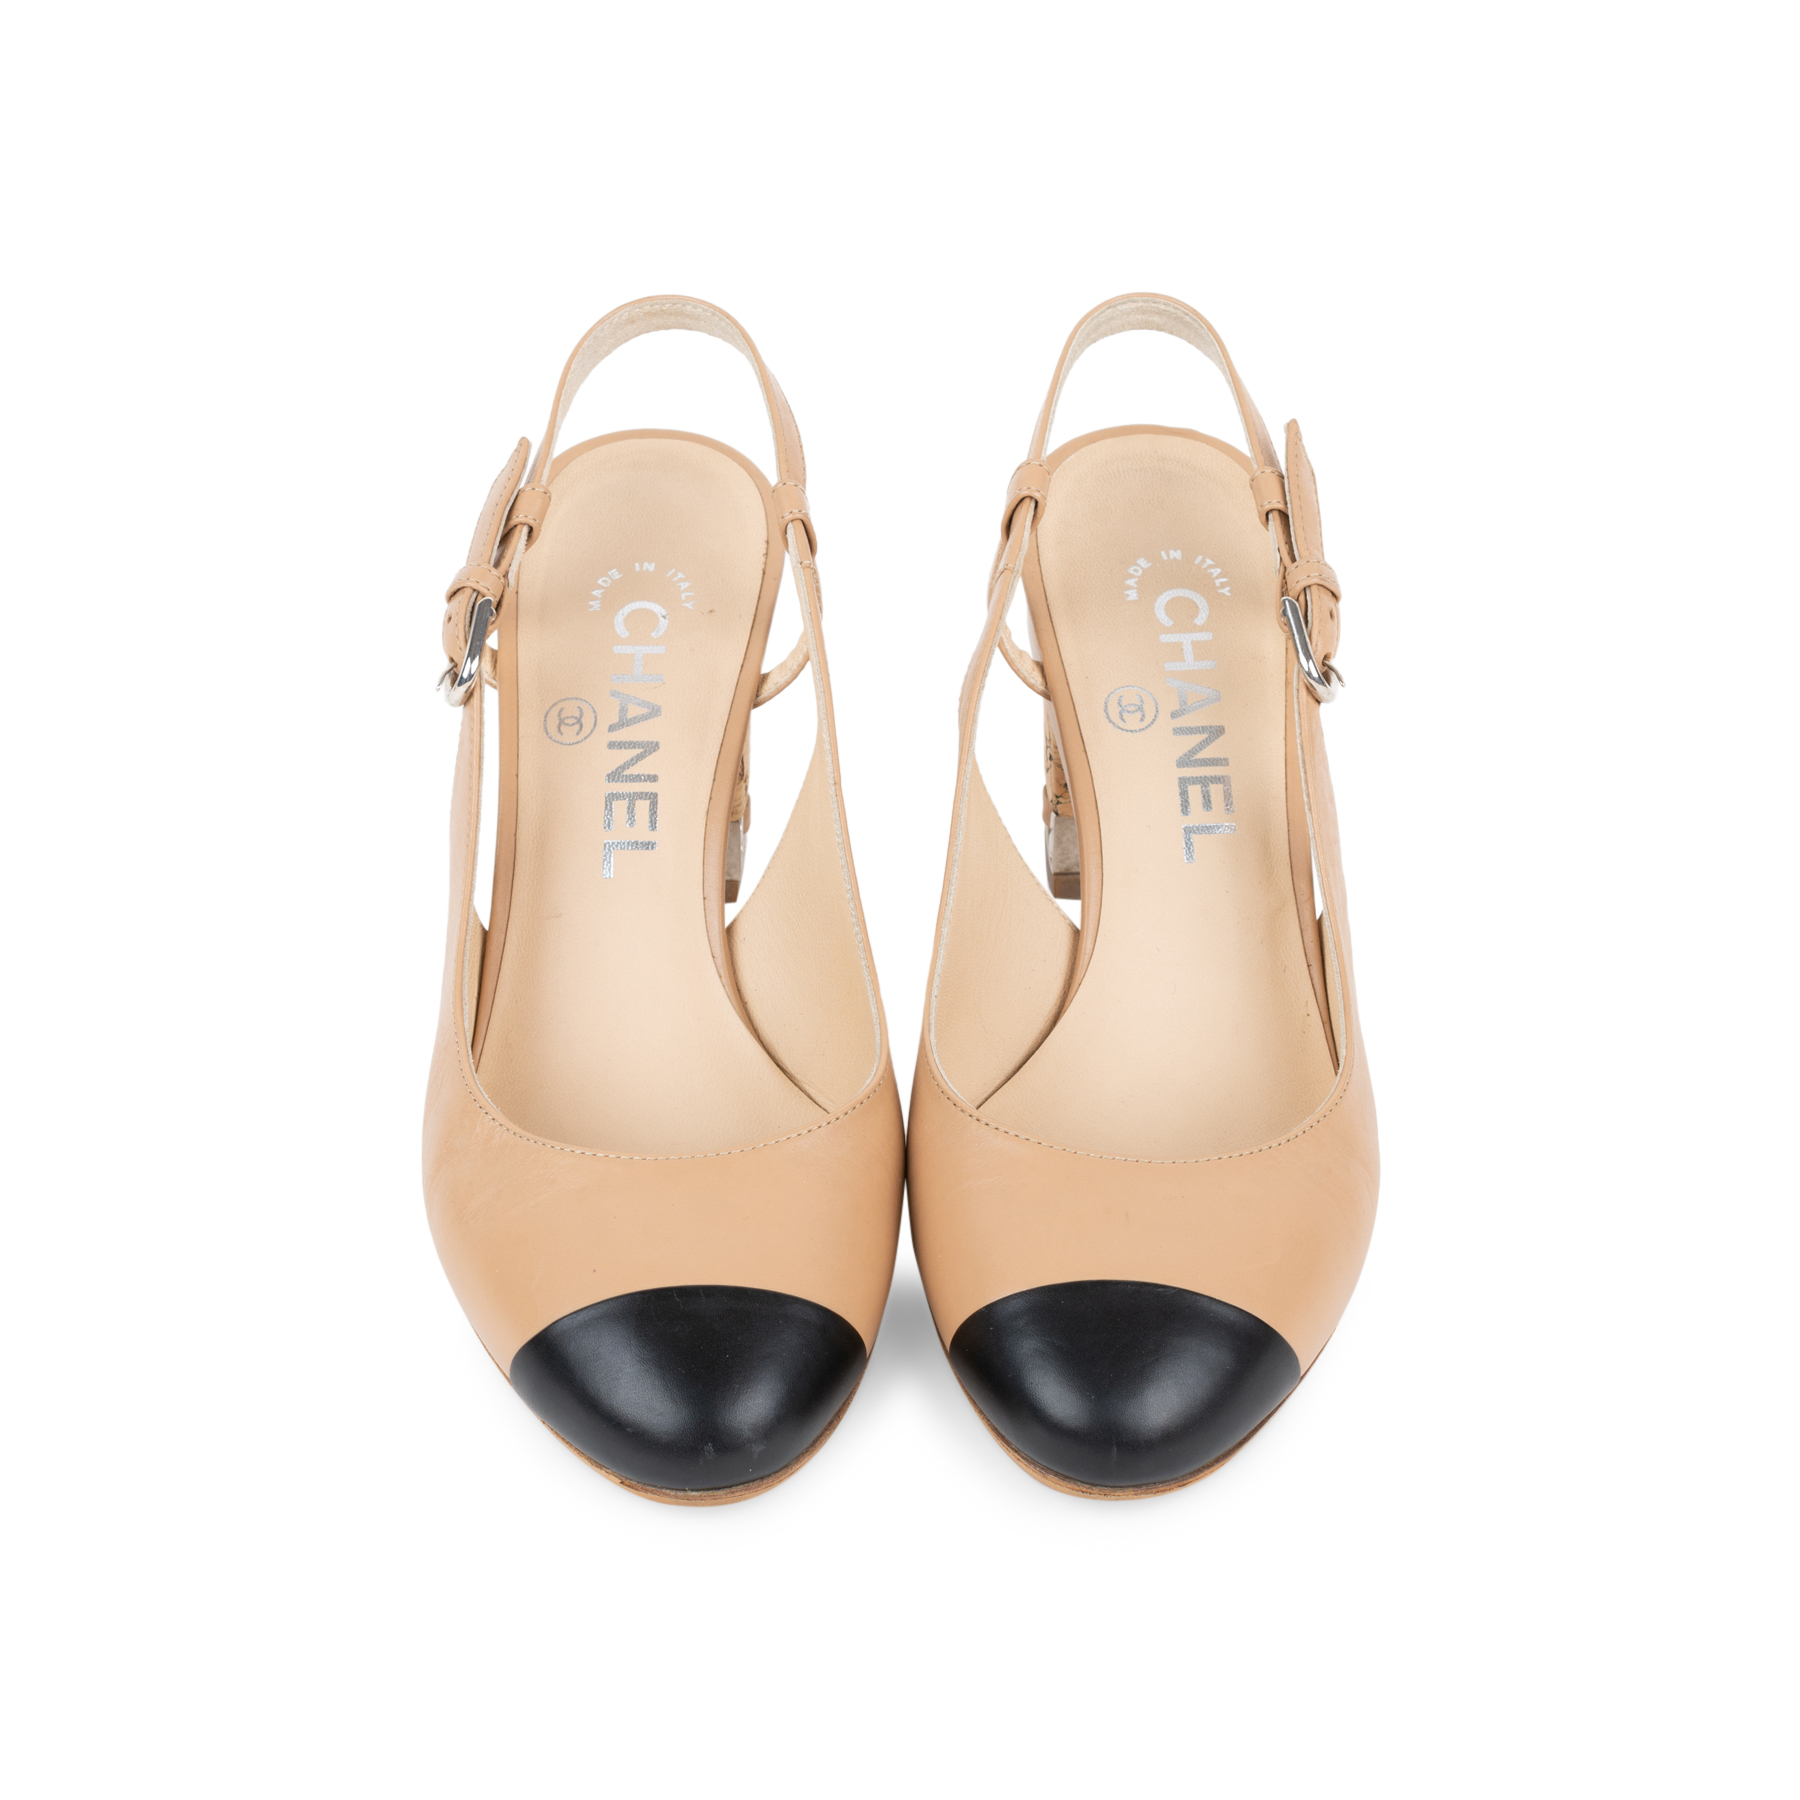 b605f2544f5 Authentic Second Hand Chanel Cap Toe Slingback Sandals (PSS-575-00039)